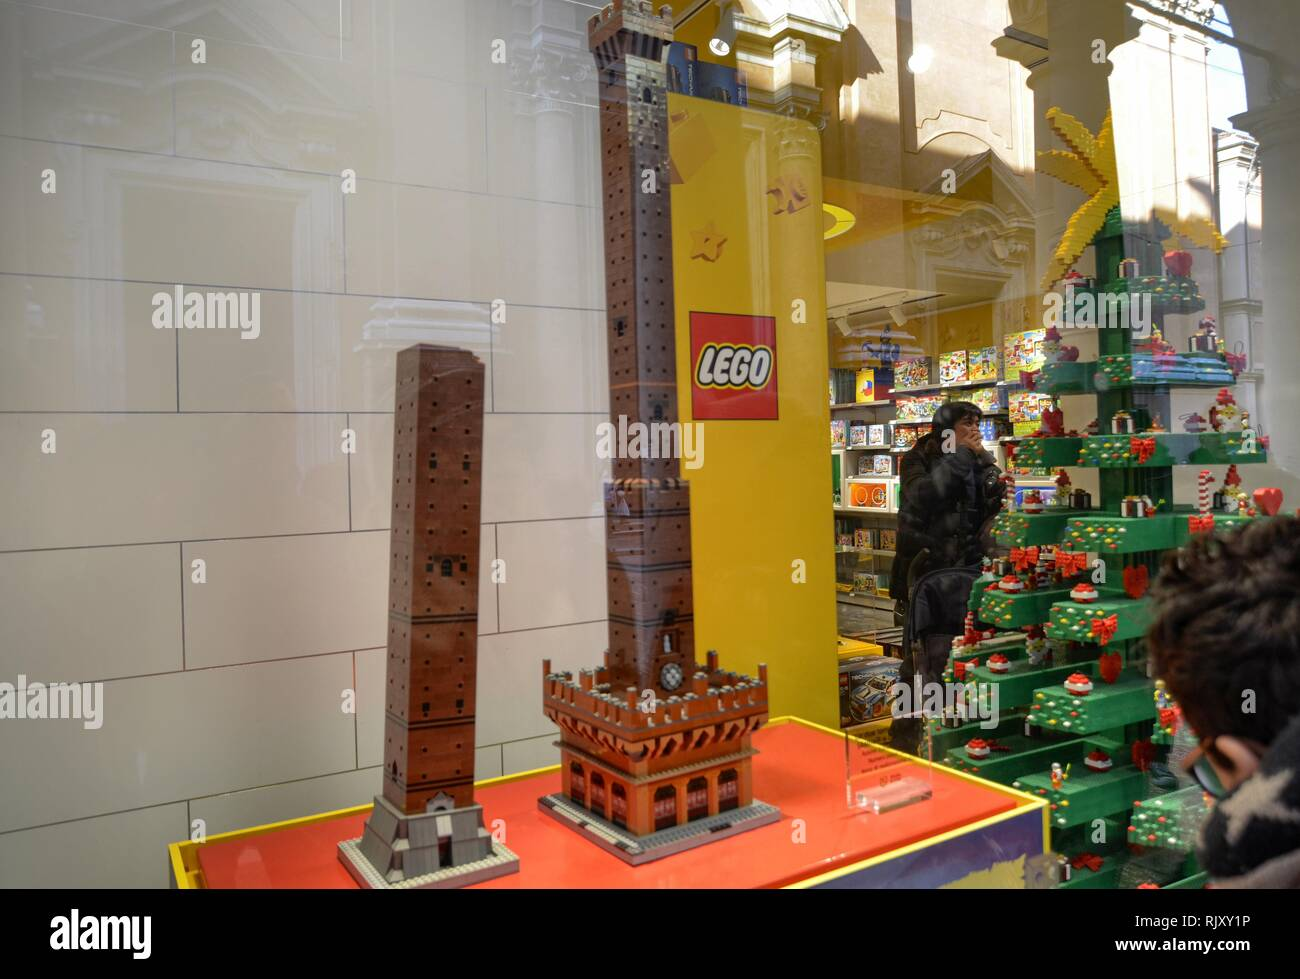 36856229749 Lego Store Lego Store Lego Bricks Photos   Lego Store Lego Store ...